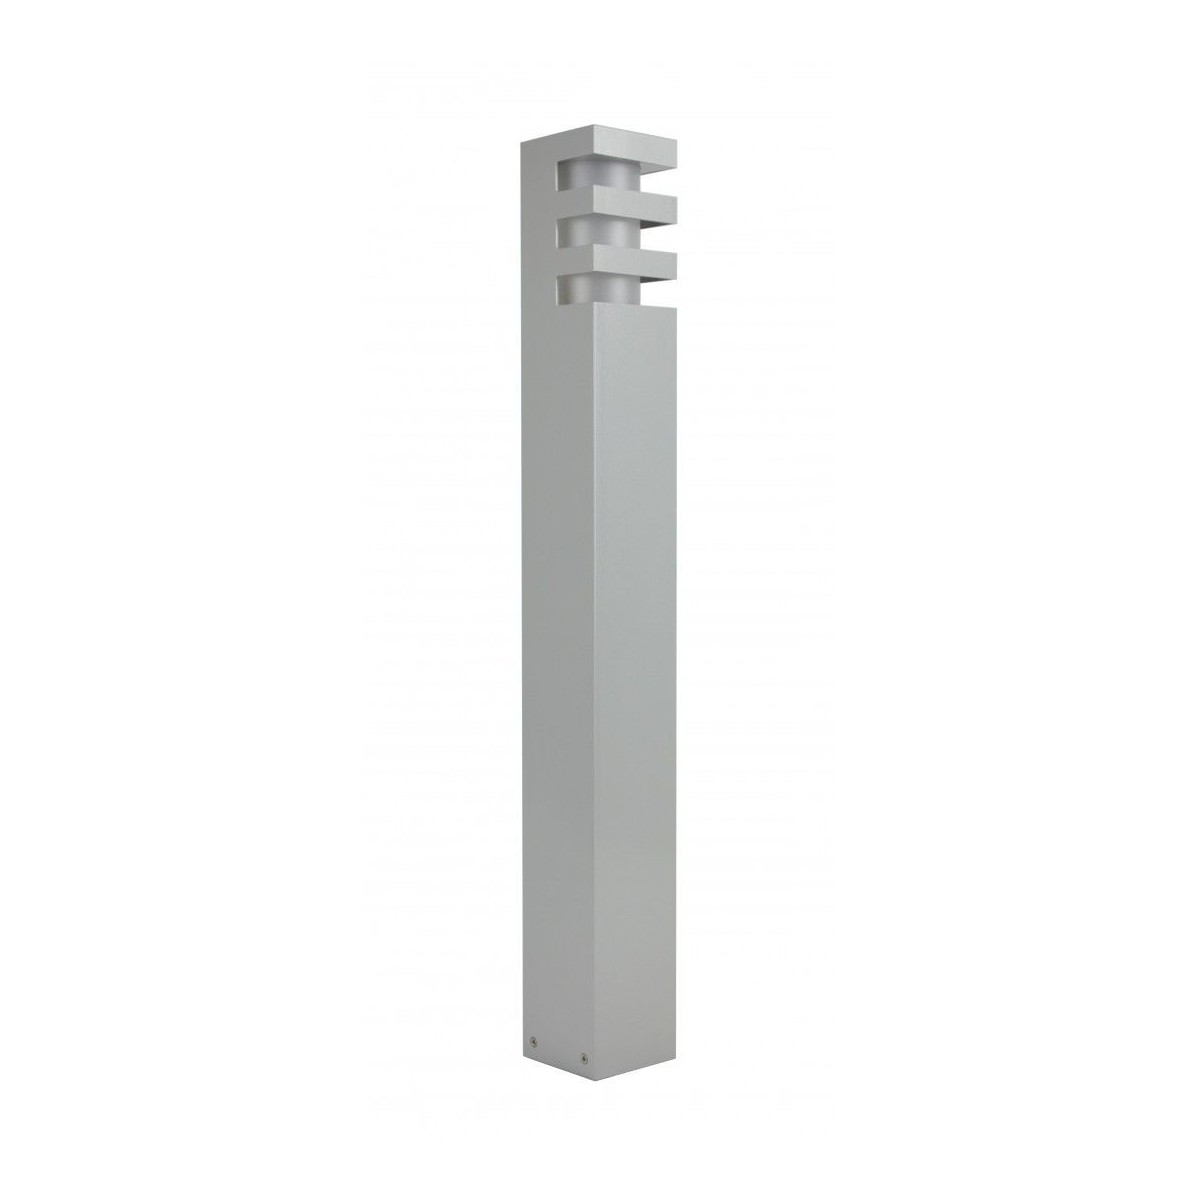 SU-MA RADO 1 75 cm Sojąca